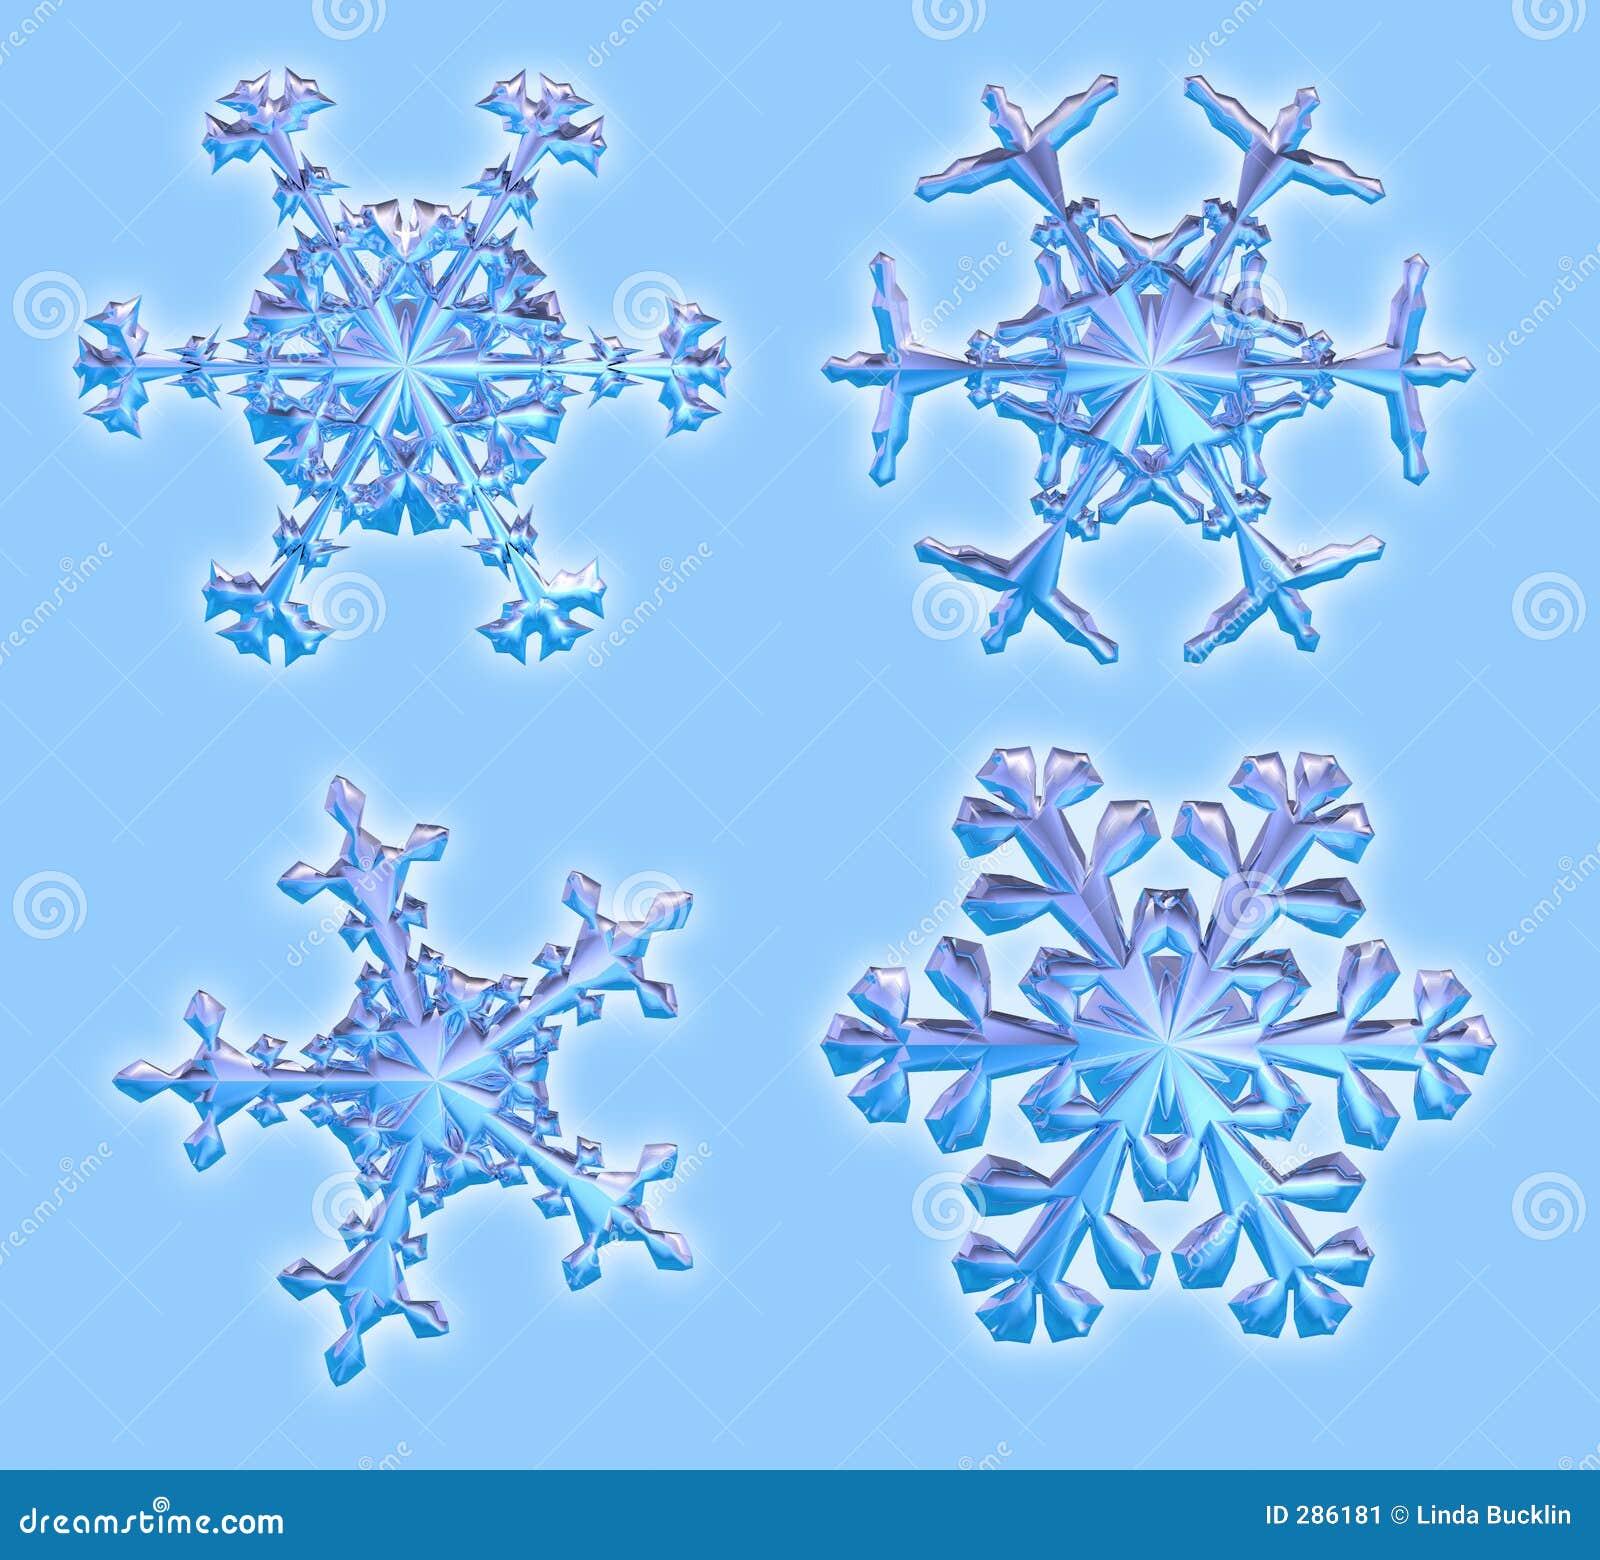 Vier 3D Sneeuwvlokken - omvat het knippen weg